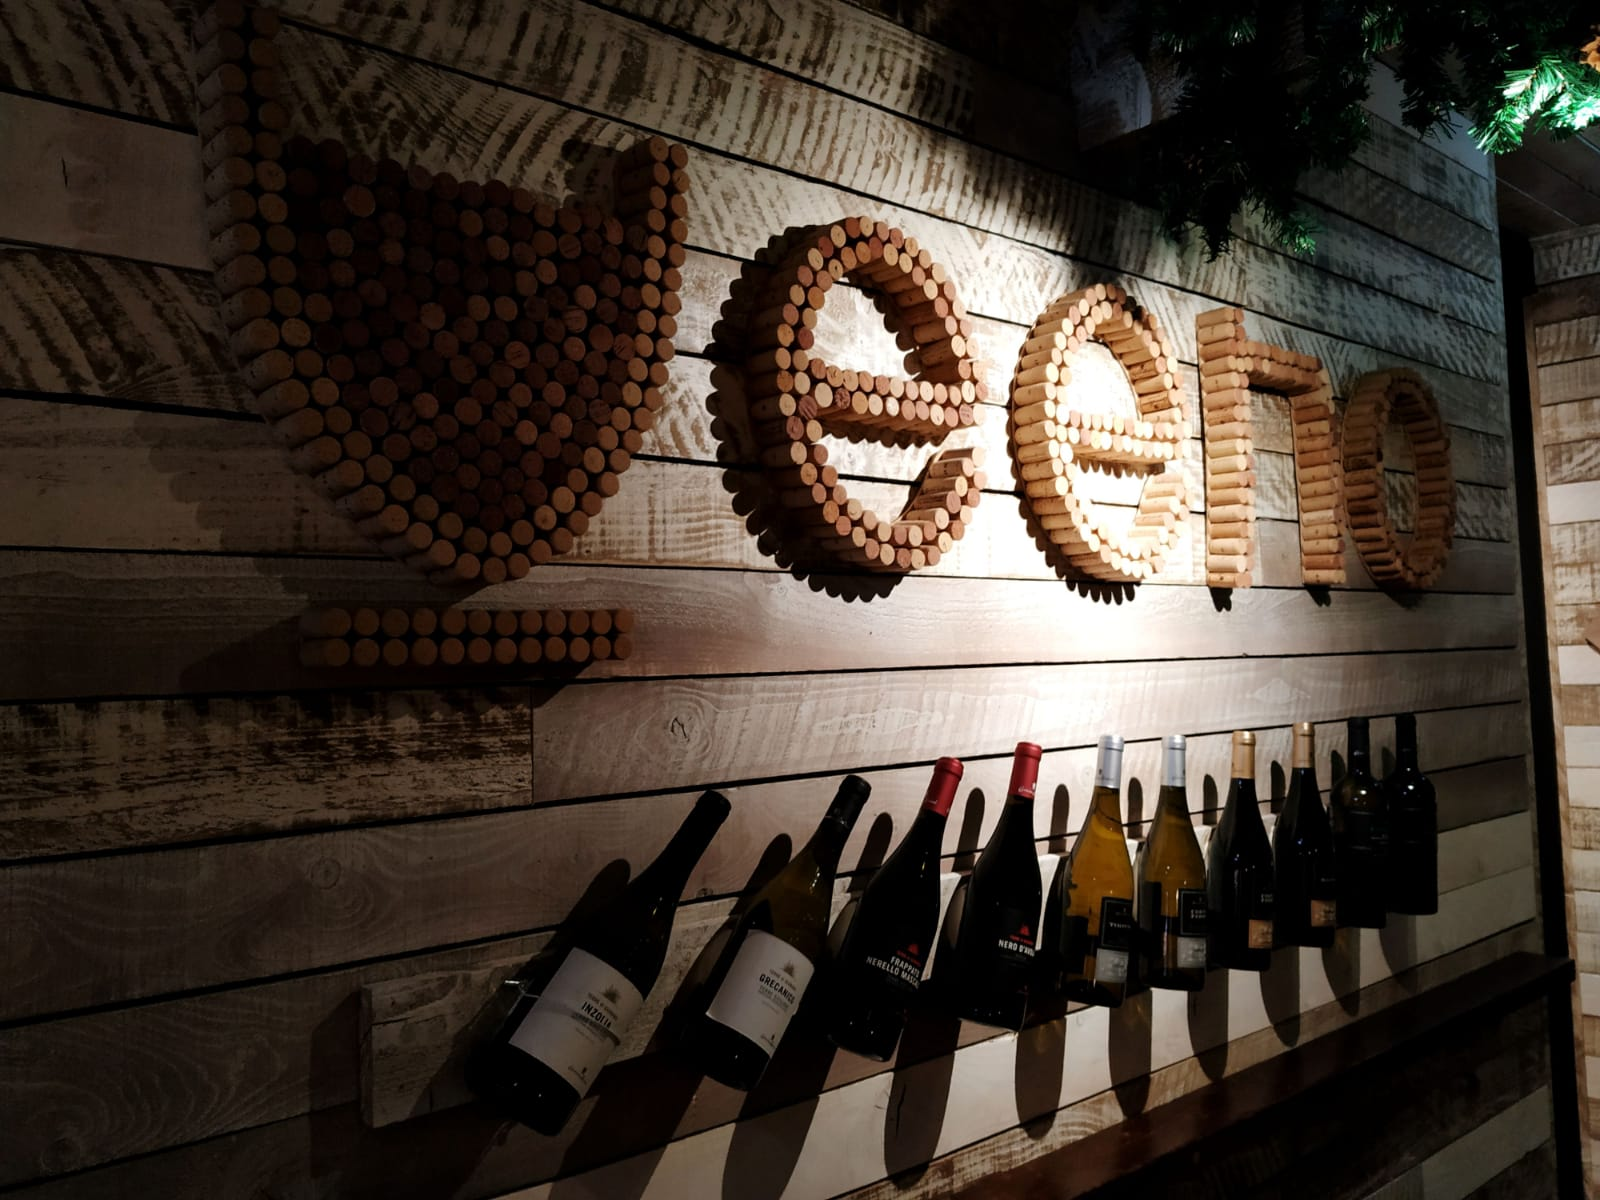 VEENO : THE ITALIAN WINE CAFE' , A GEM IN THE HEART OF CROYDON